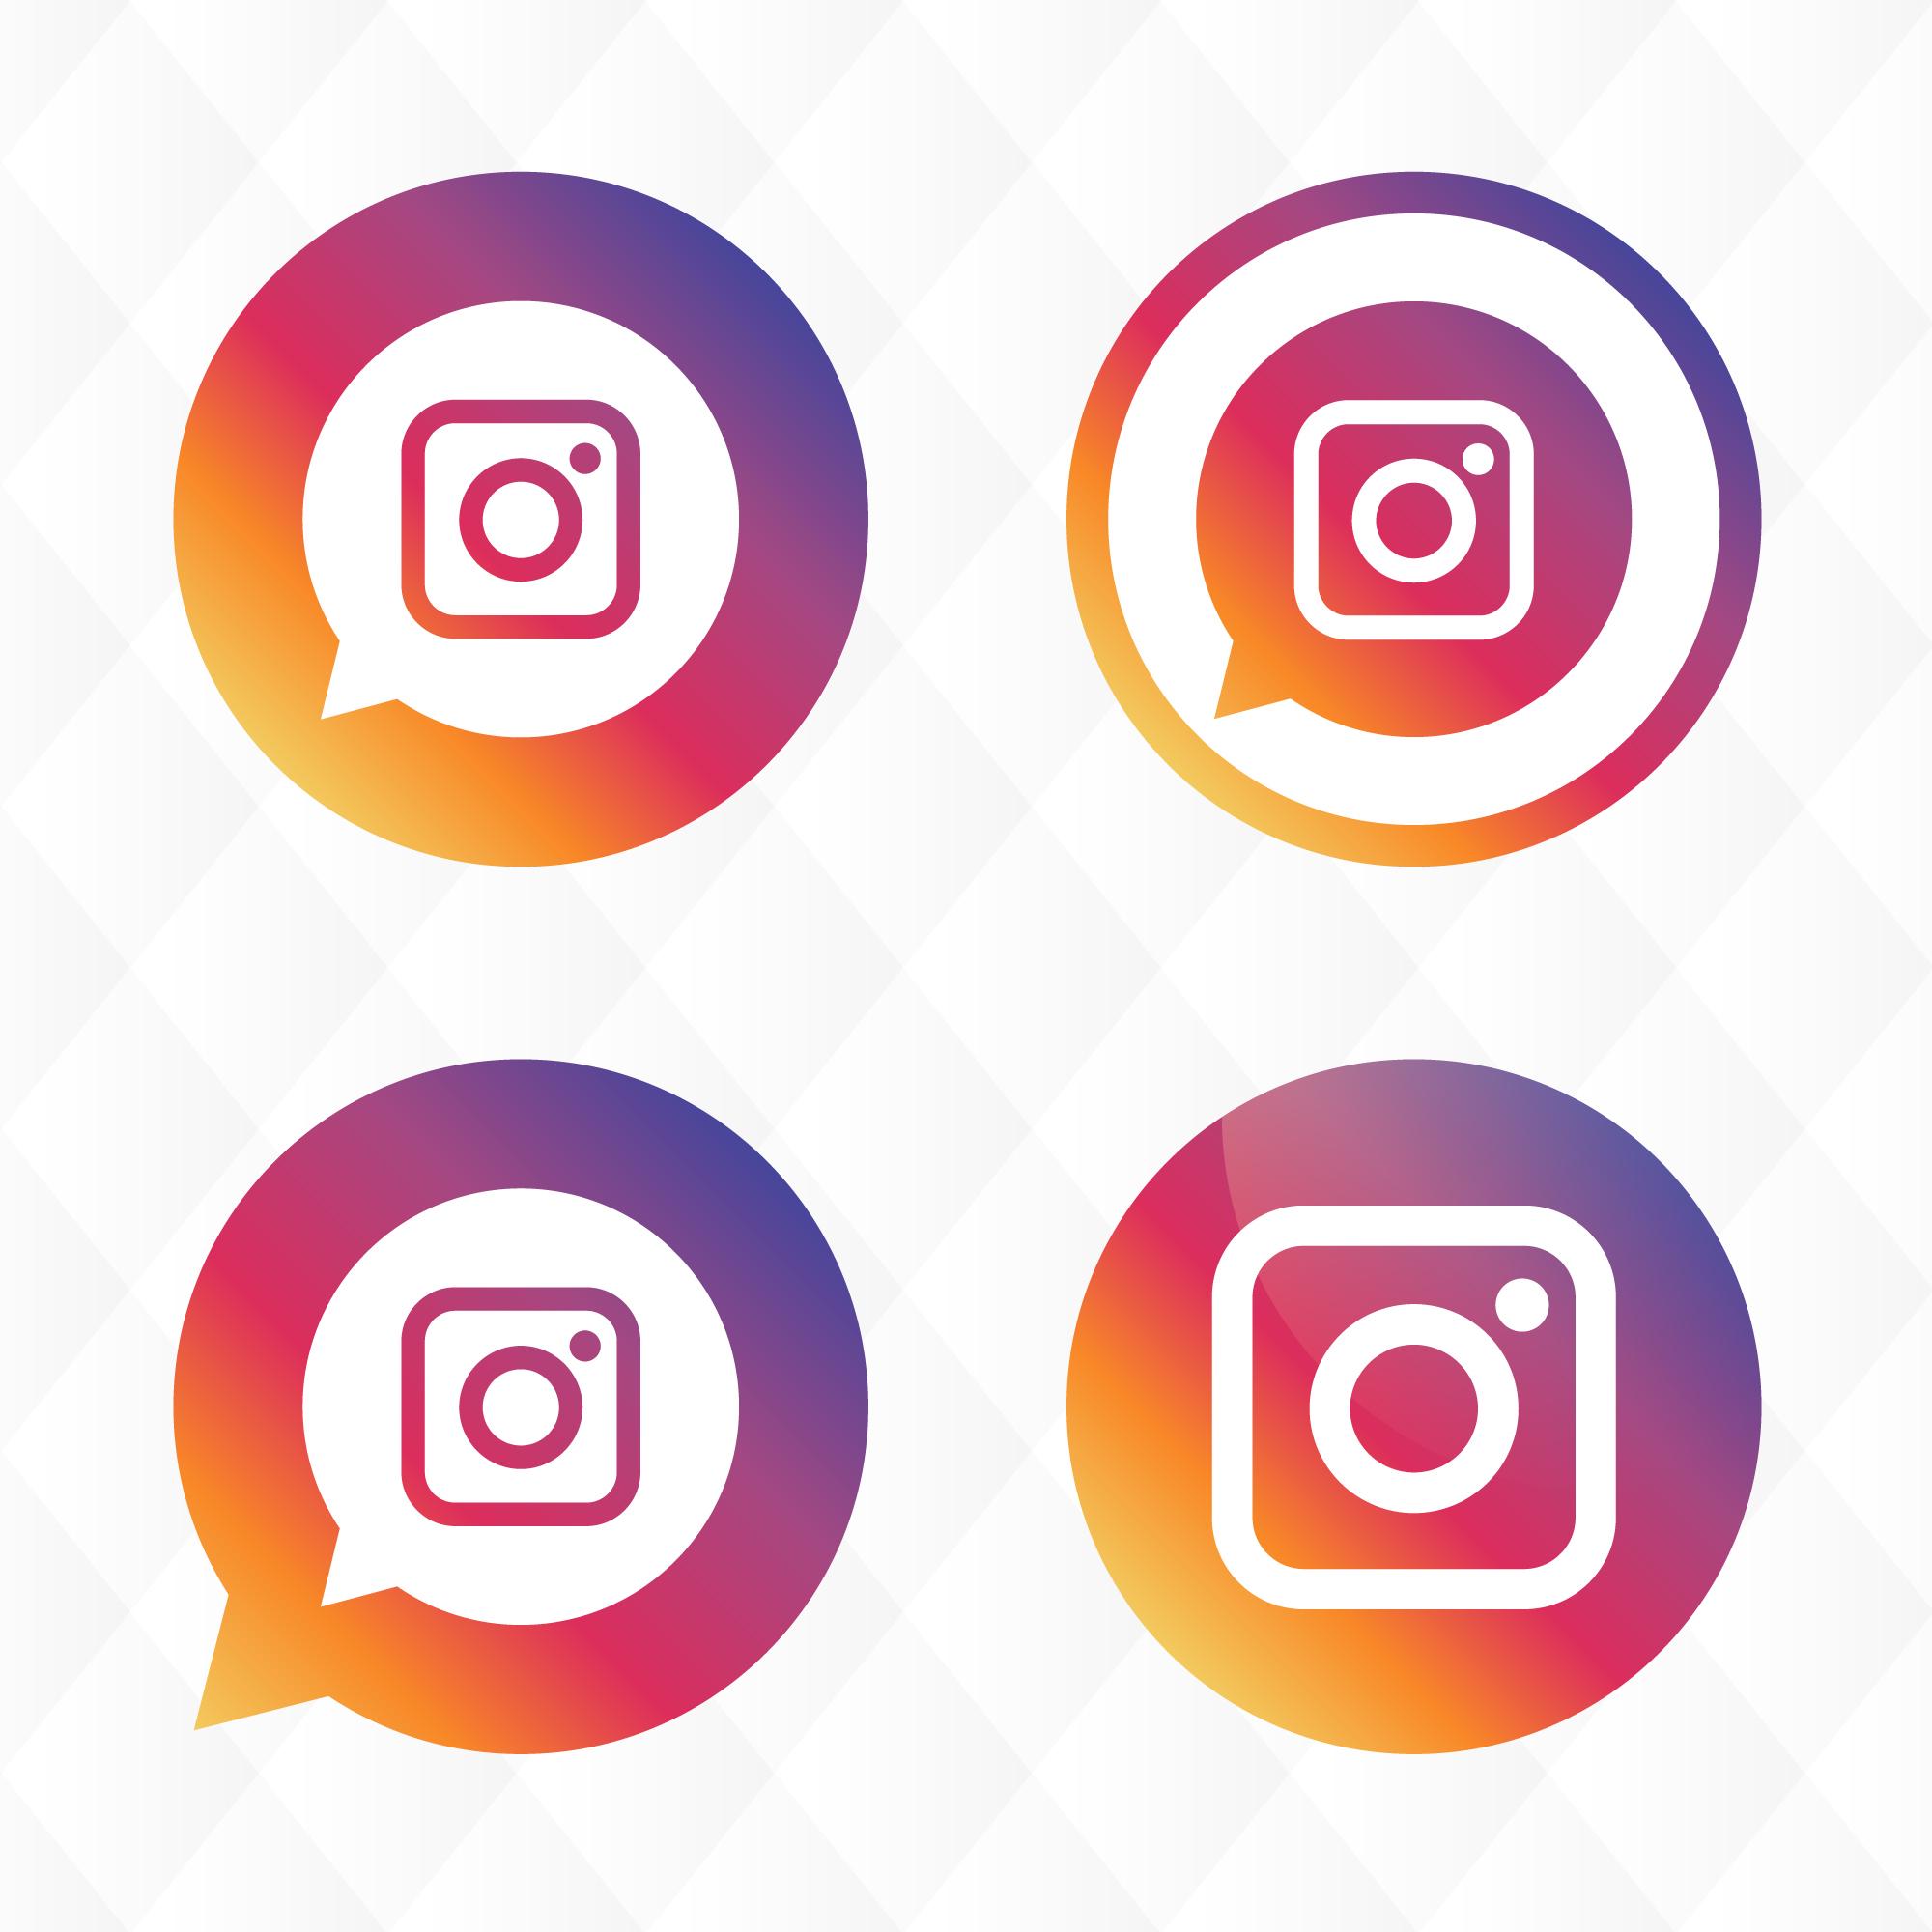 Vector Illustration Instagram: Download Free Vector Art, Stock Graphics